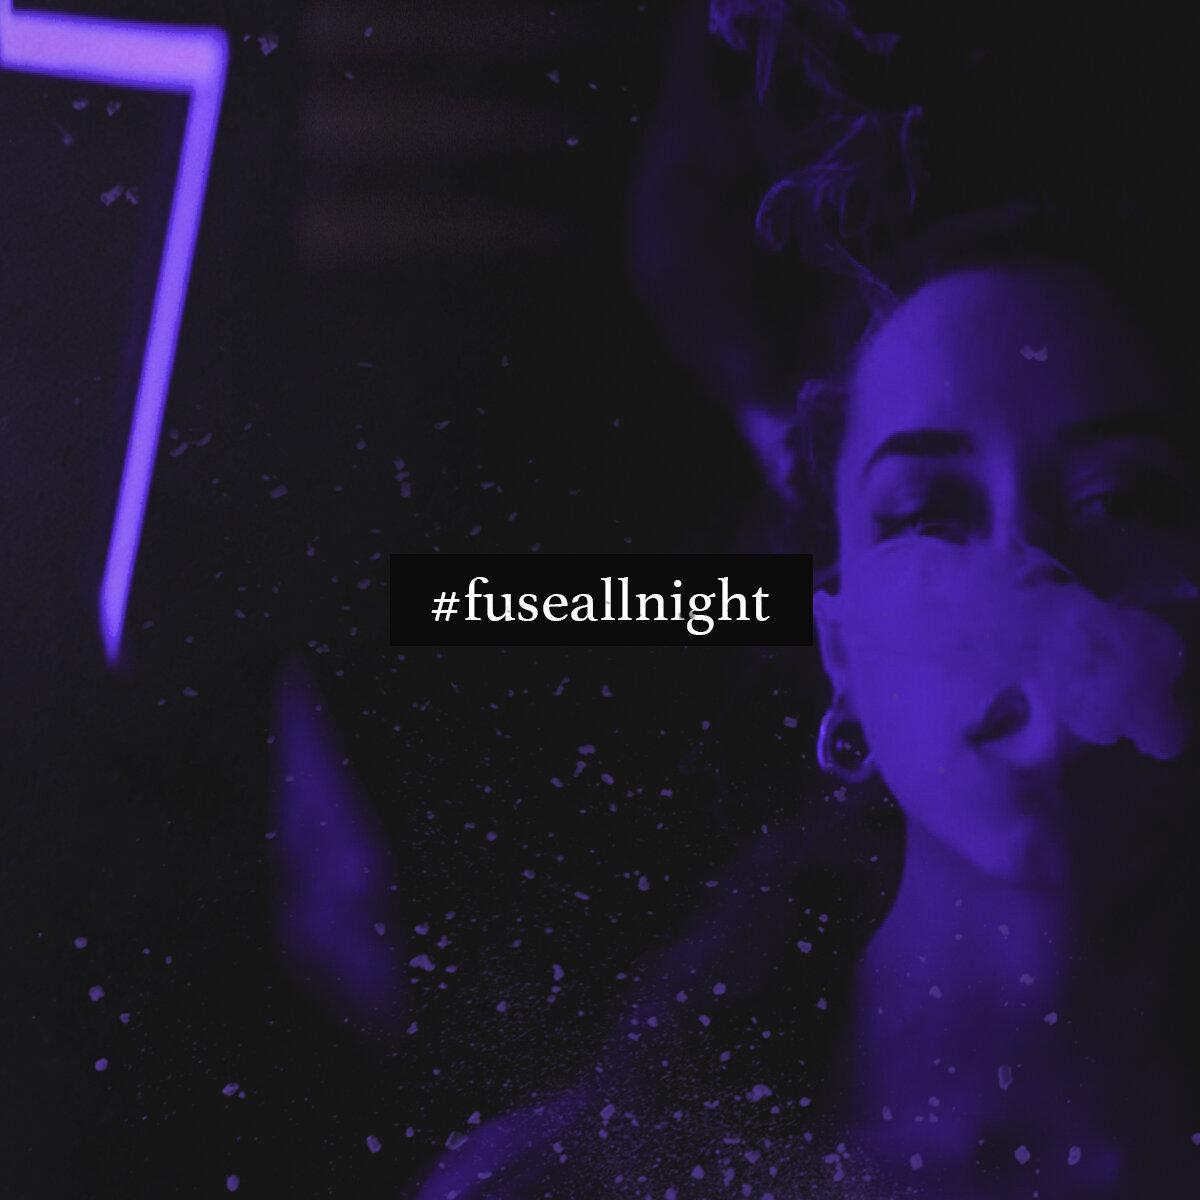 FuseAllNight_profile_Hashtag_new.jpg